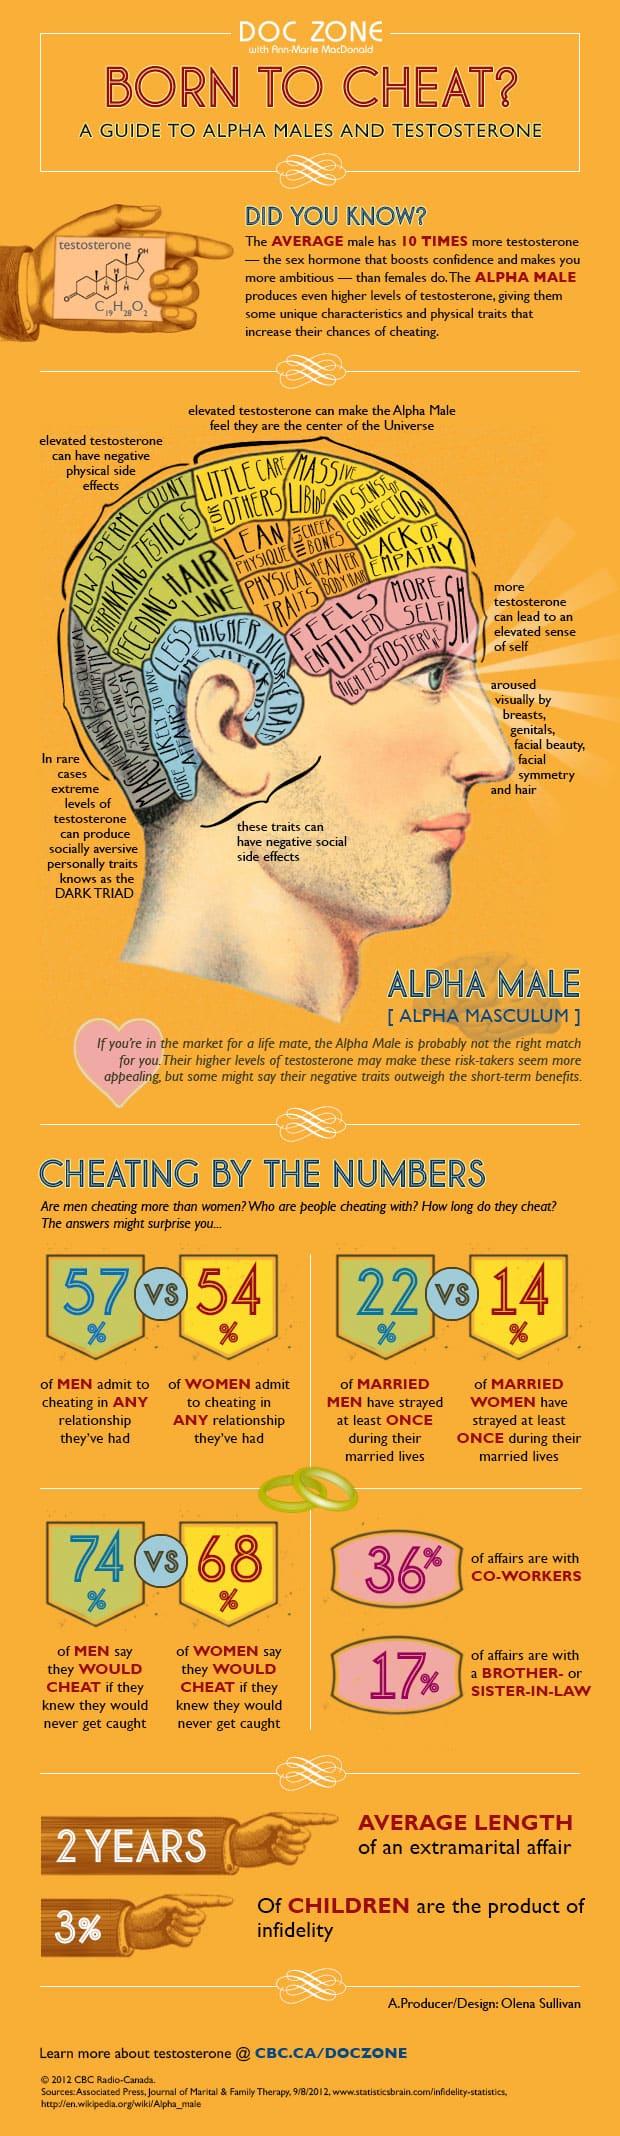 cheat hymen